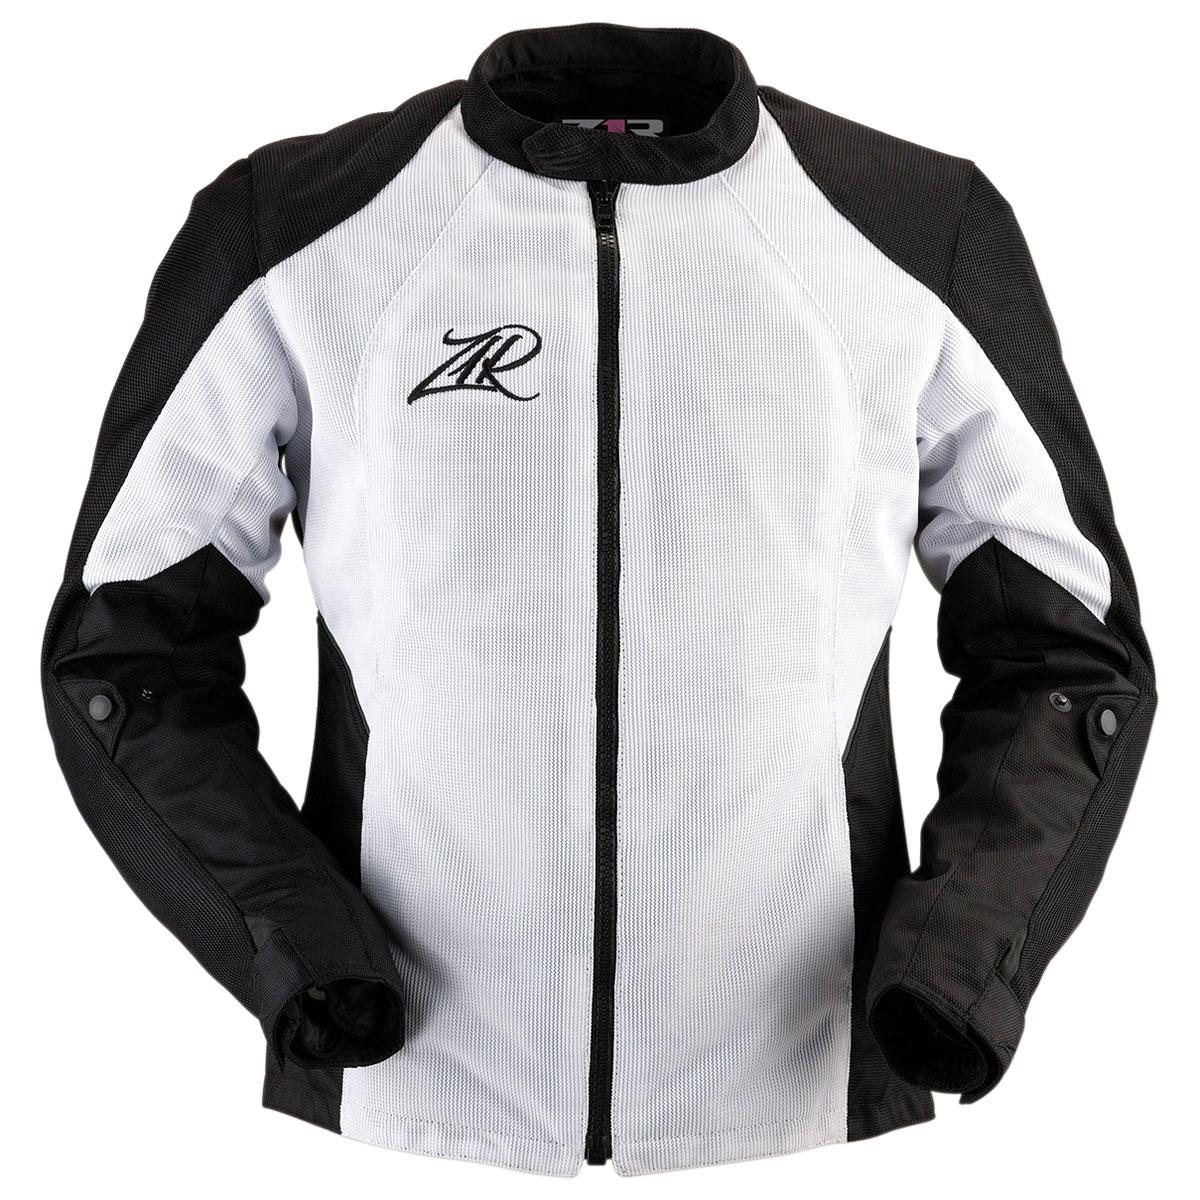 Z1R Women's Gust Black/White Mesh Jacket